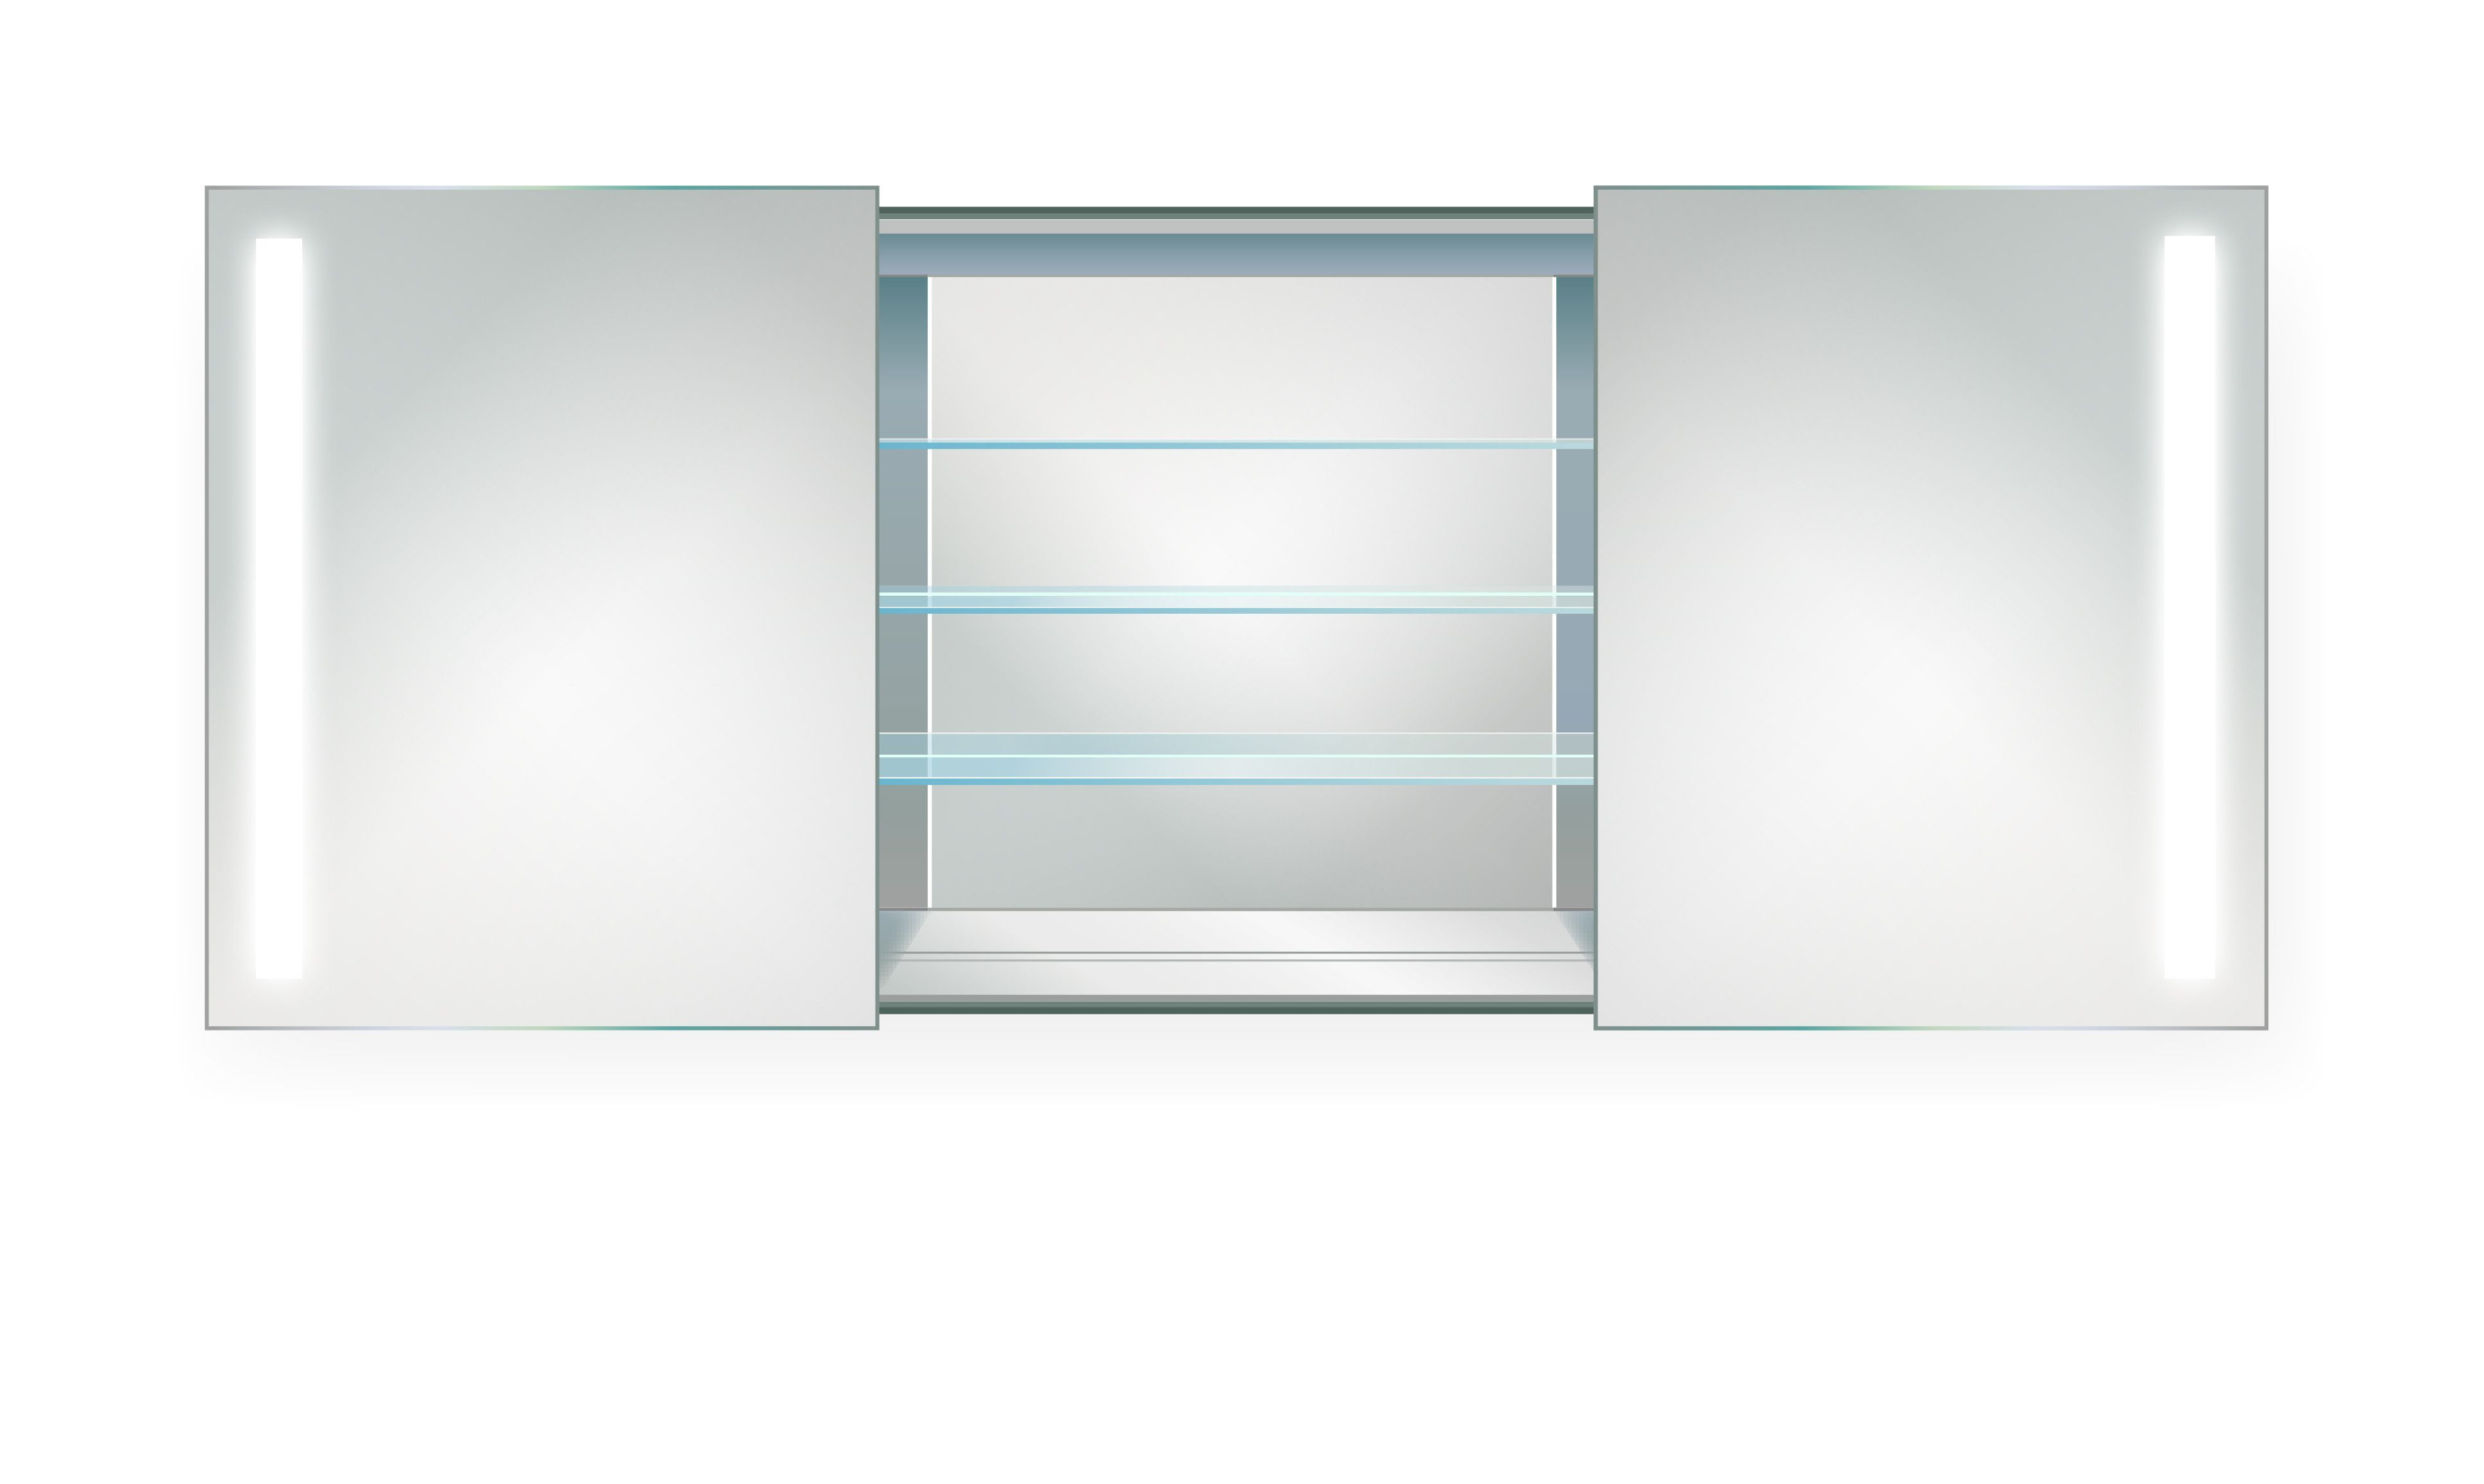 LED Medicine Cabinet 48 Inch X 30 Inch | Lighted 2 Sliding Mirror Doors U0026  Defogger + 3 Glass Shelves